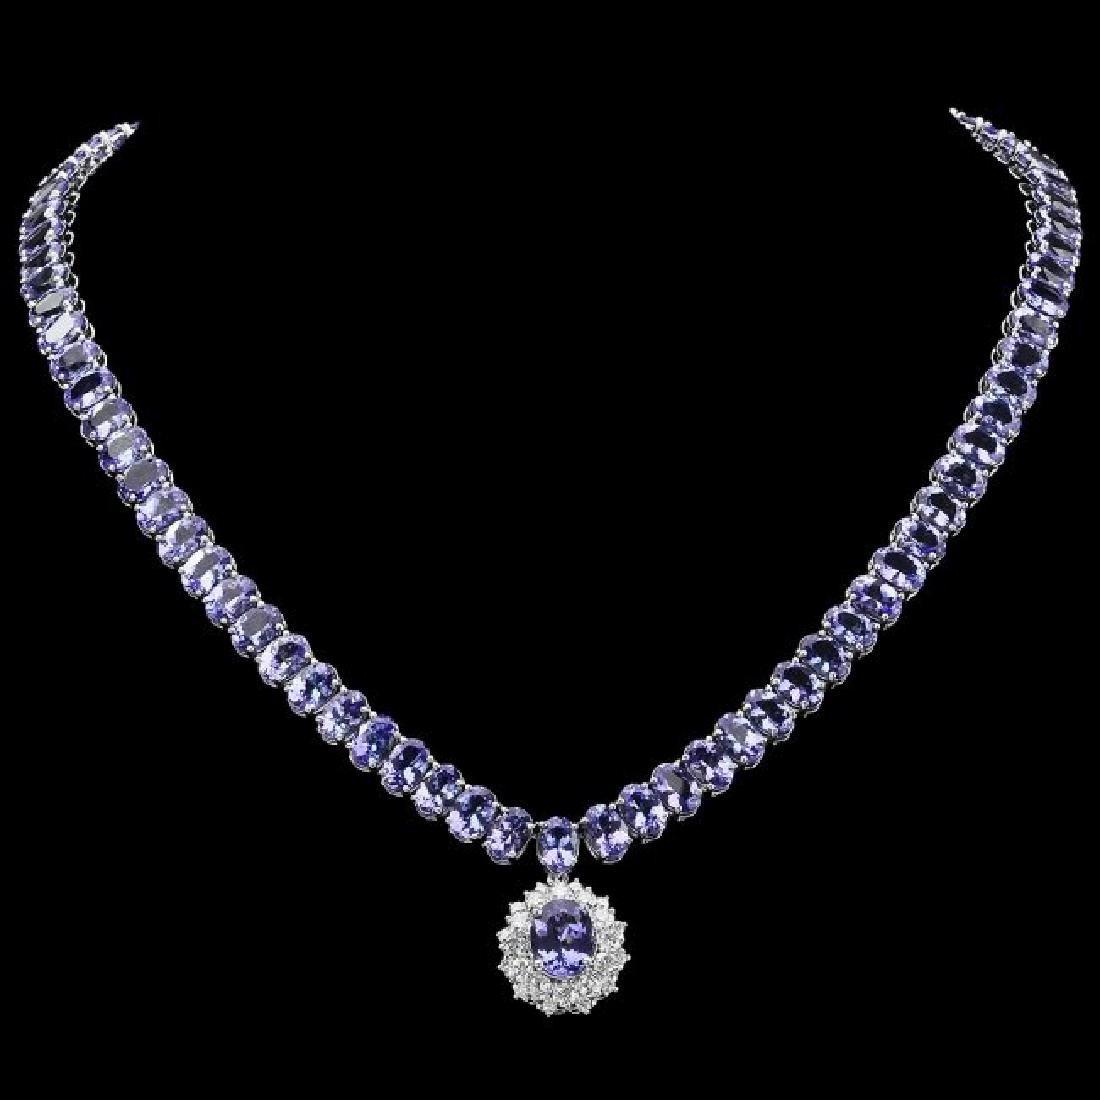 14k Gold 64.5ct Tanzanite 1.60ct Diamond Necklace - 2